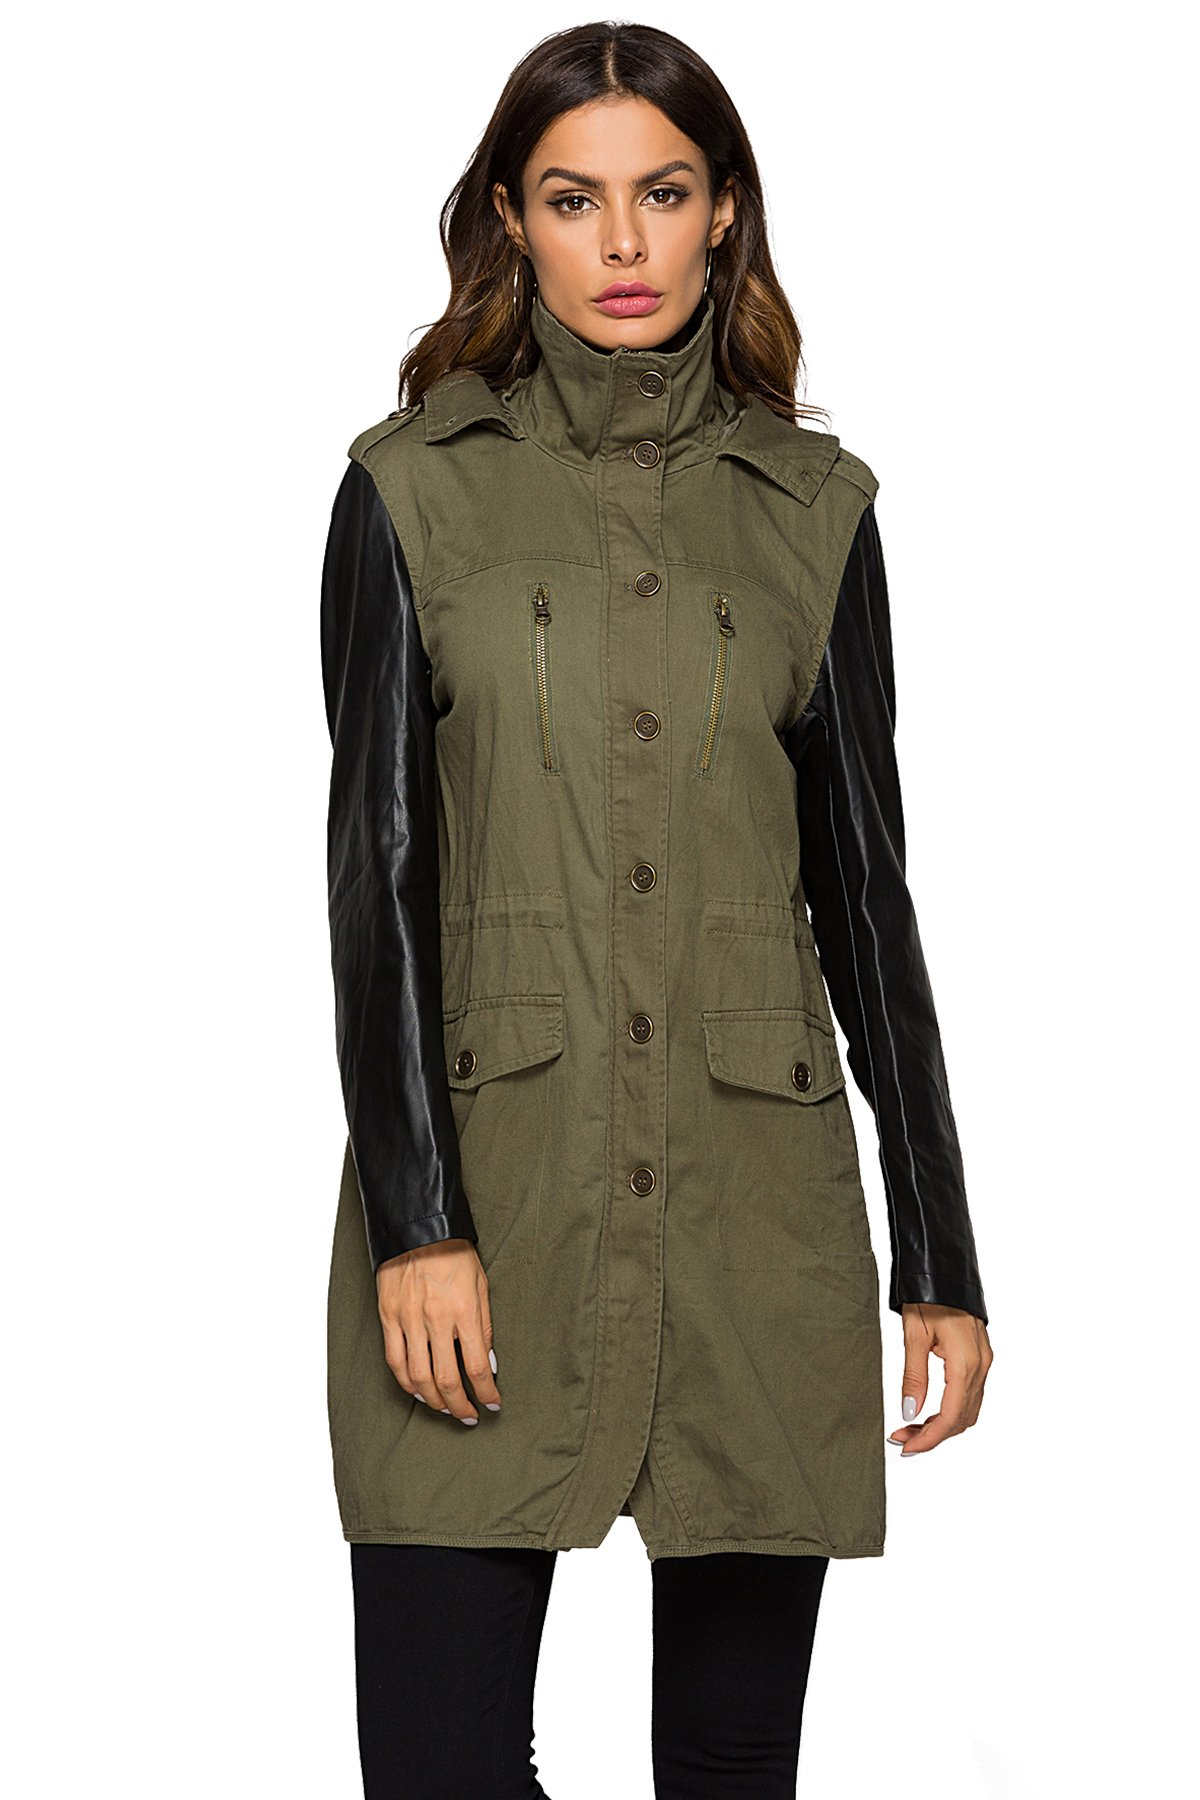 Escalier Women`s Leather Sleeve Jacket Hooded Anorak Safari Parka Coat Army Green M by Escalier